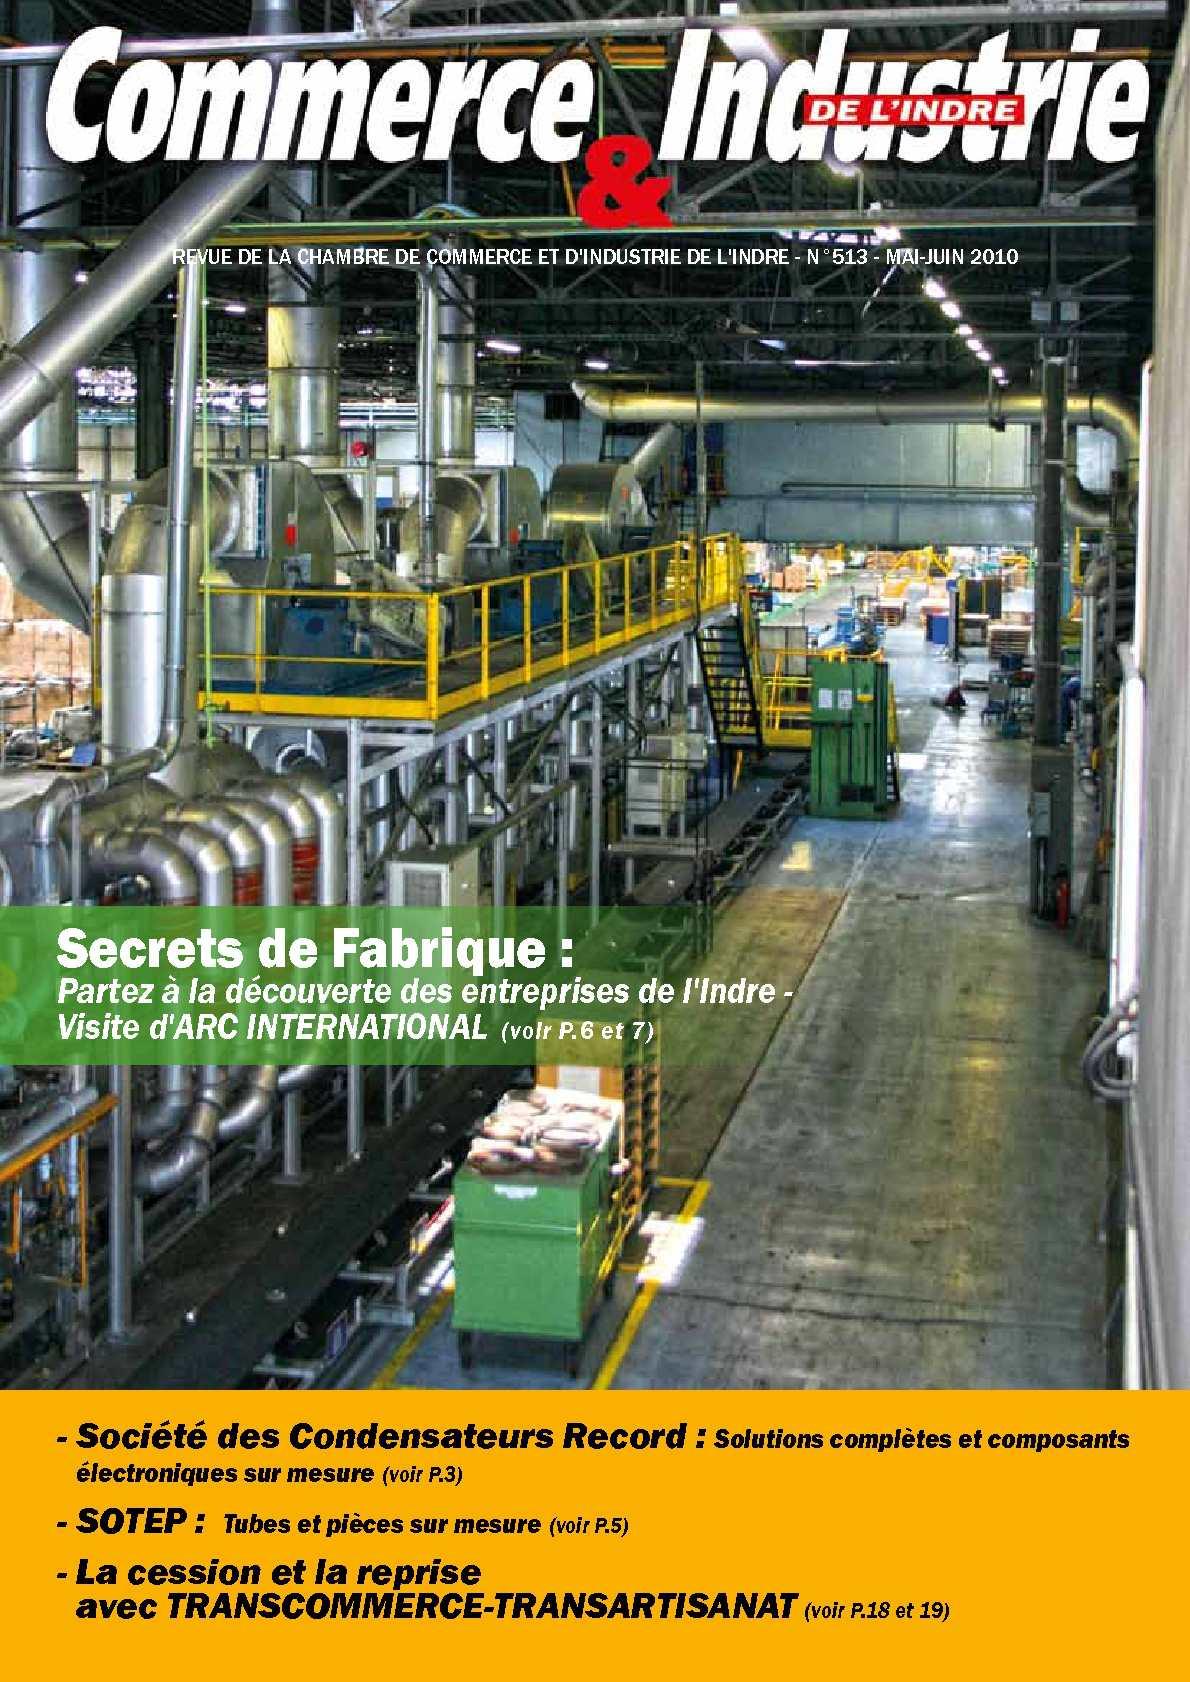 Calam o commerce industrie de l 39 indre n 513 - Chambre de commerce et de l industrie ...